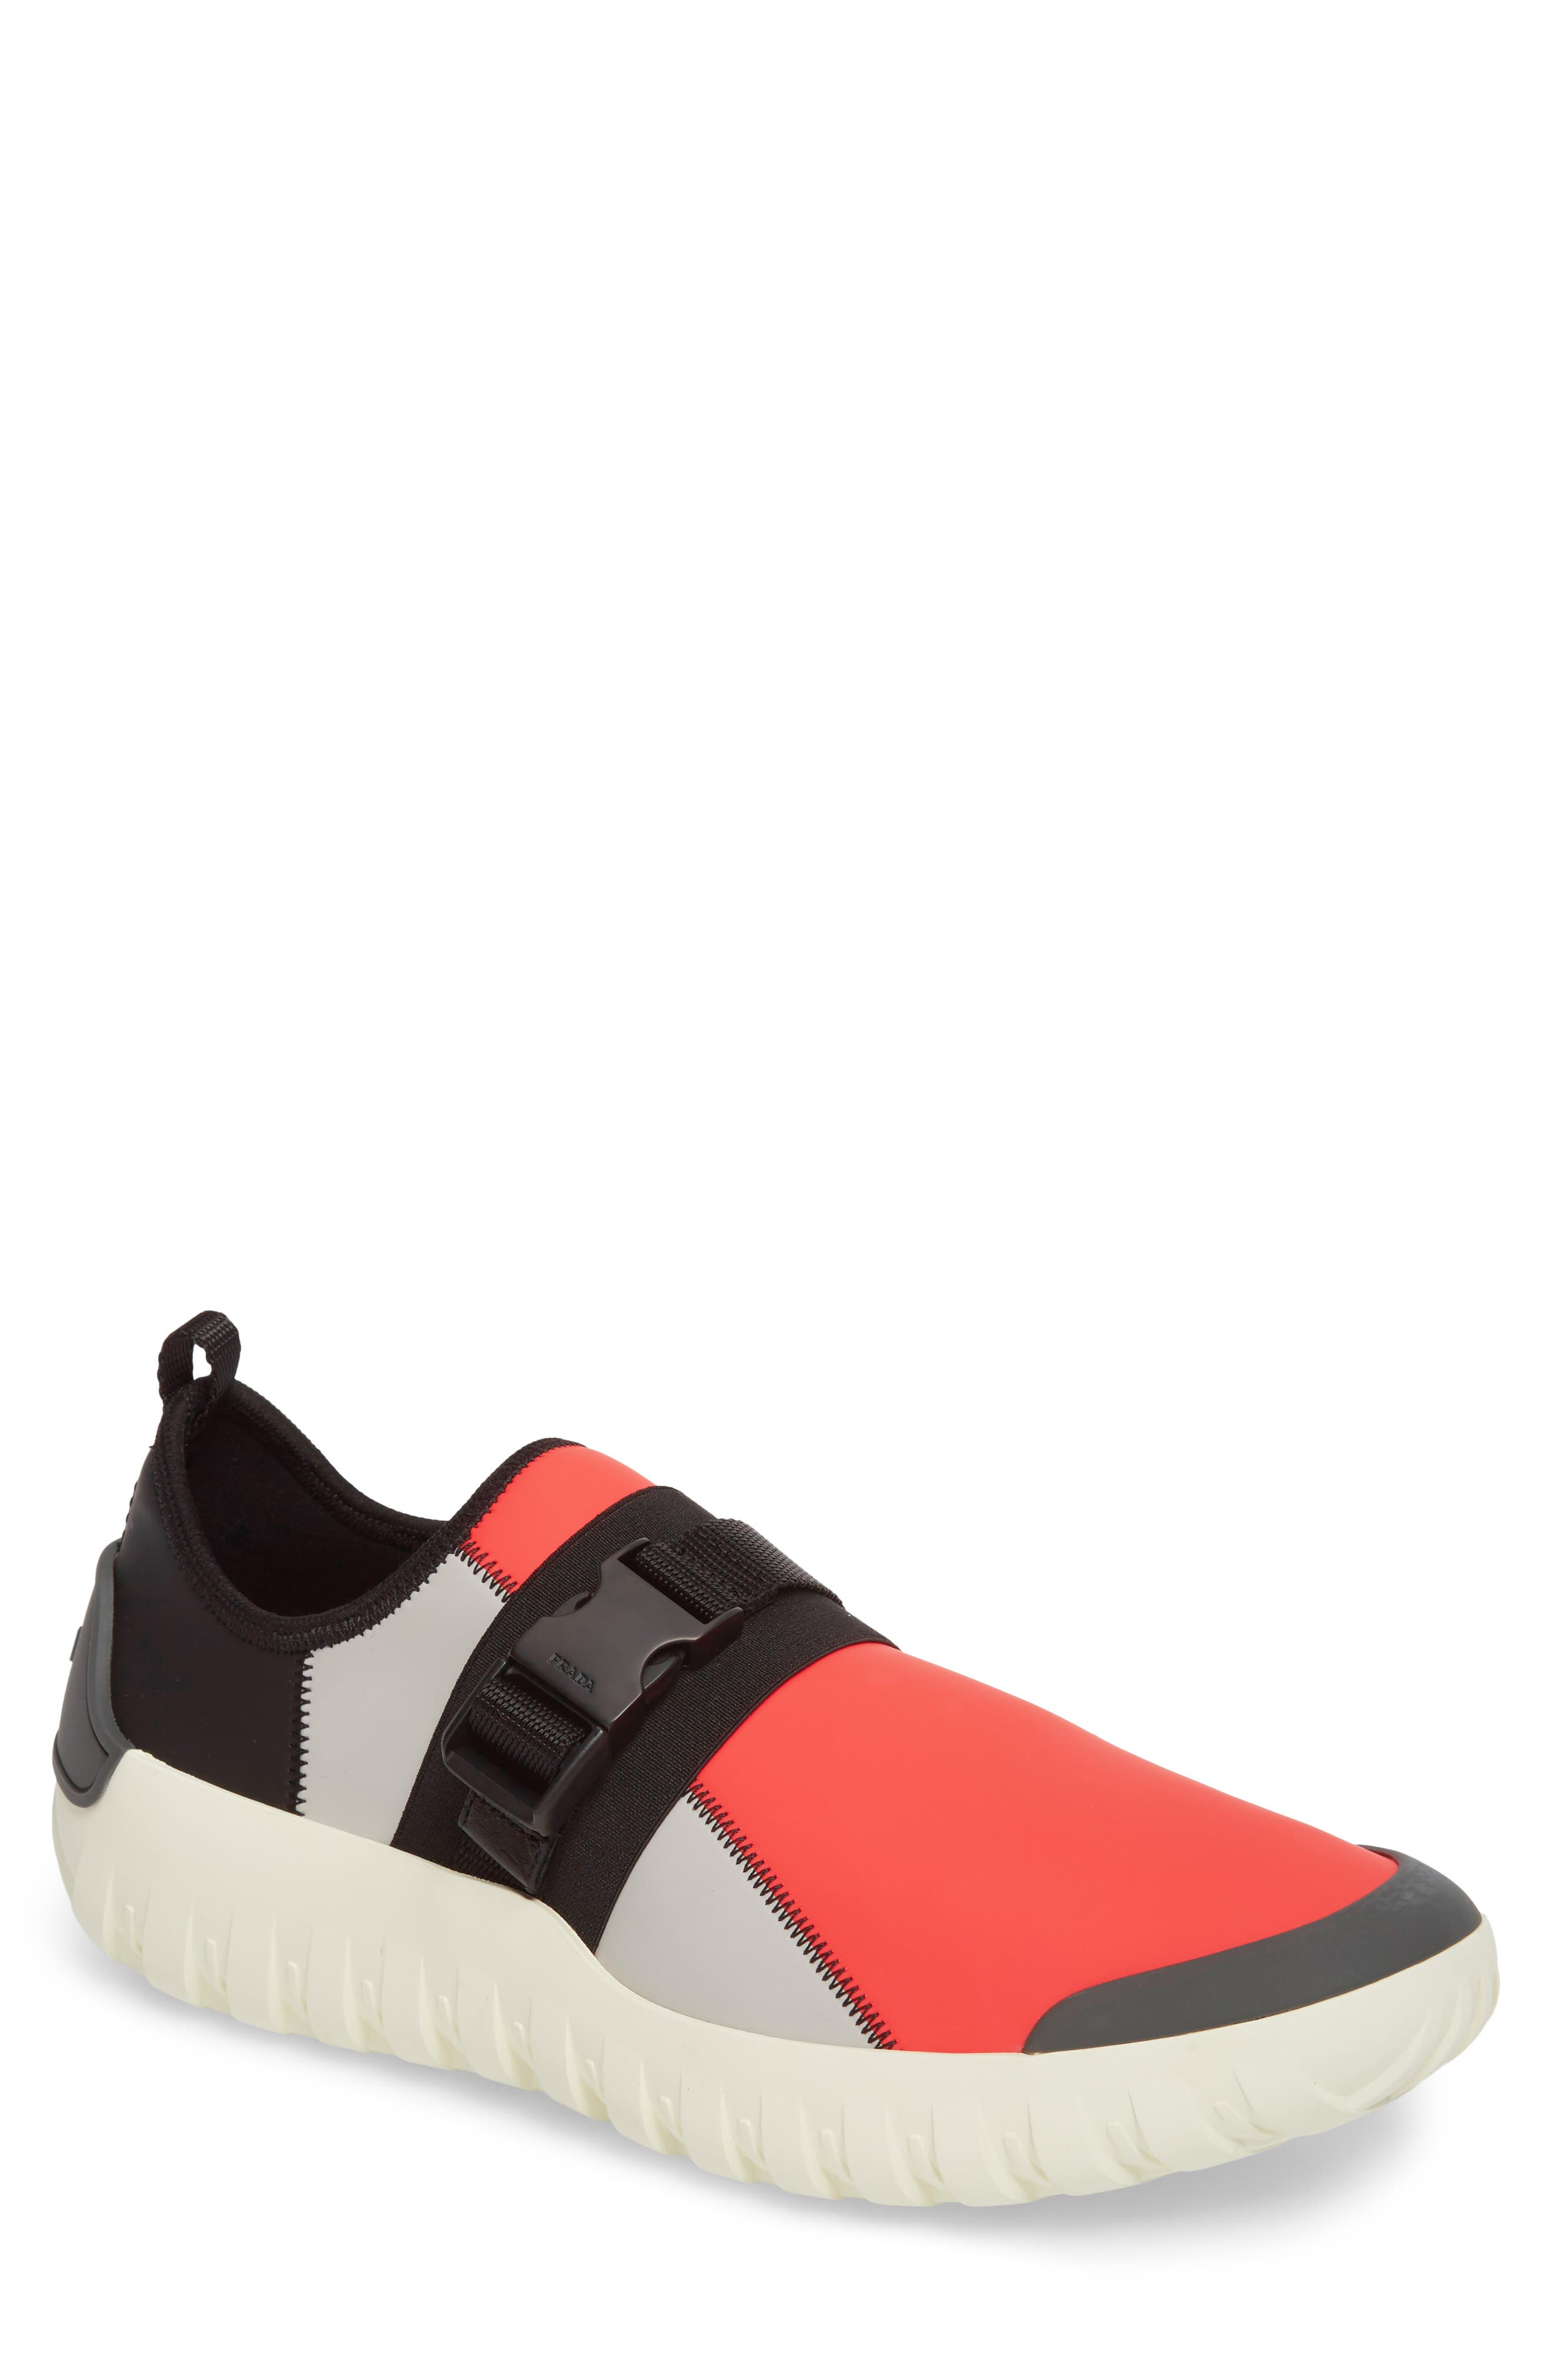 Linea Rossa Slip-On,                         Main,                         color, Arancio Orange